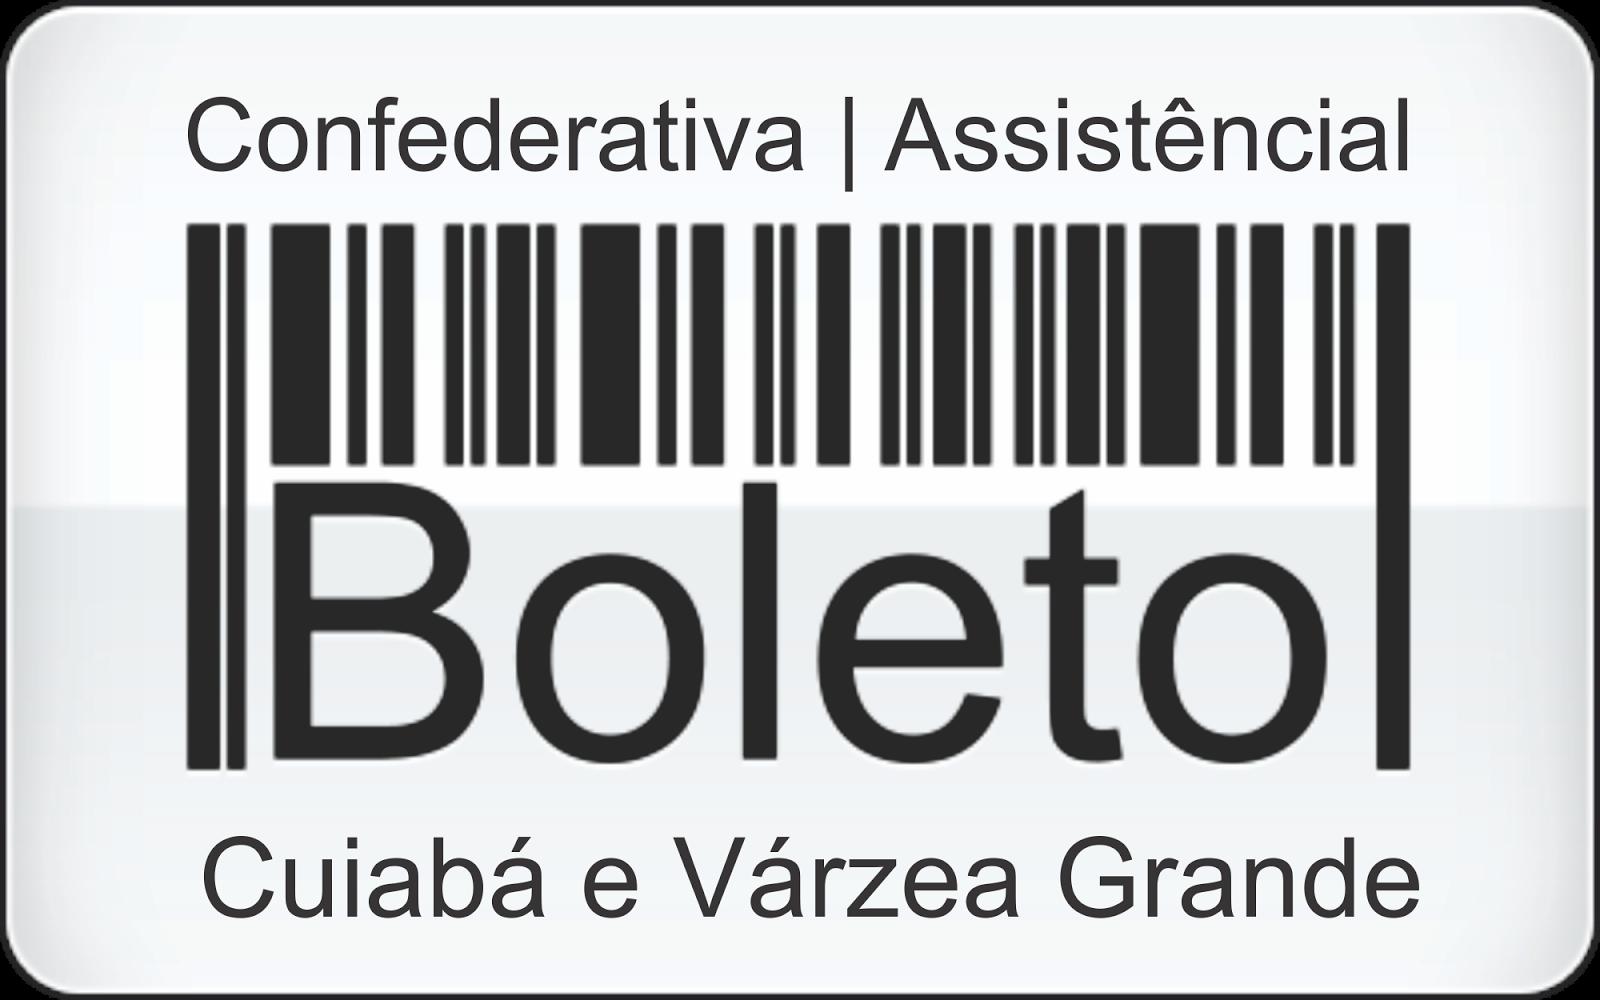 Boleto confederat./assist. (CBA/VG)